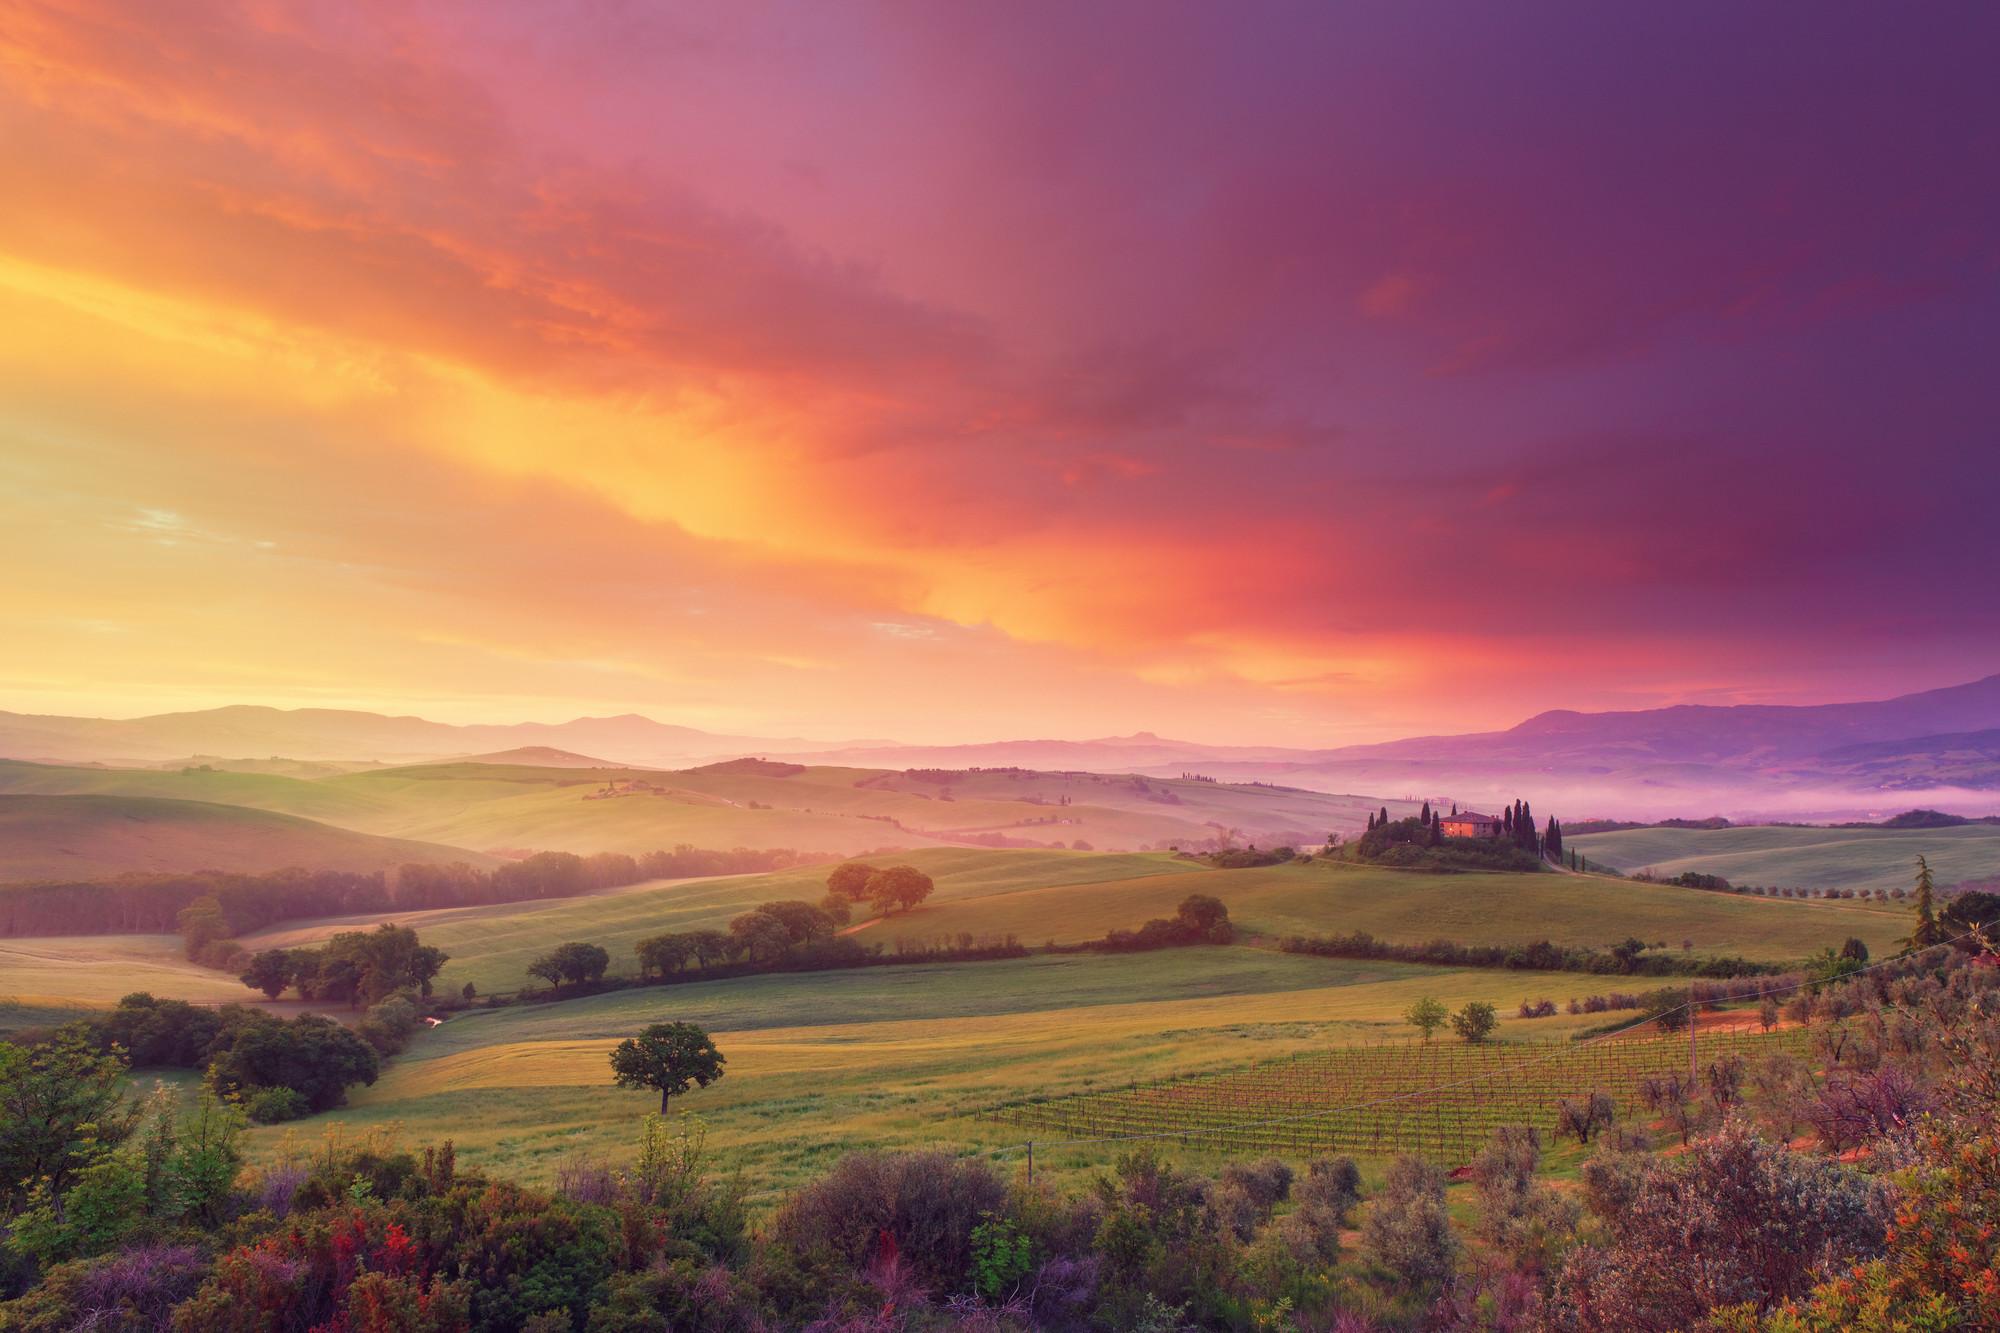 Spahelg Toscana